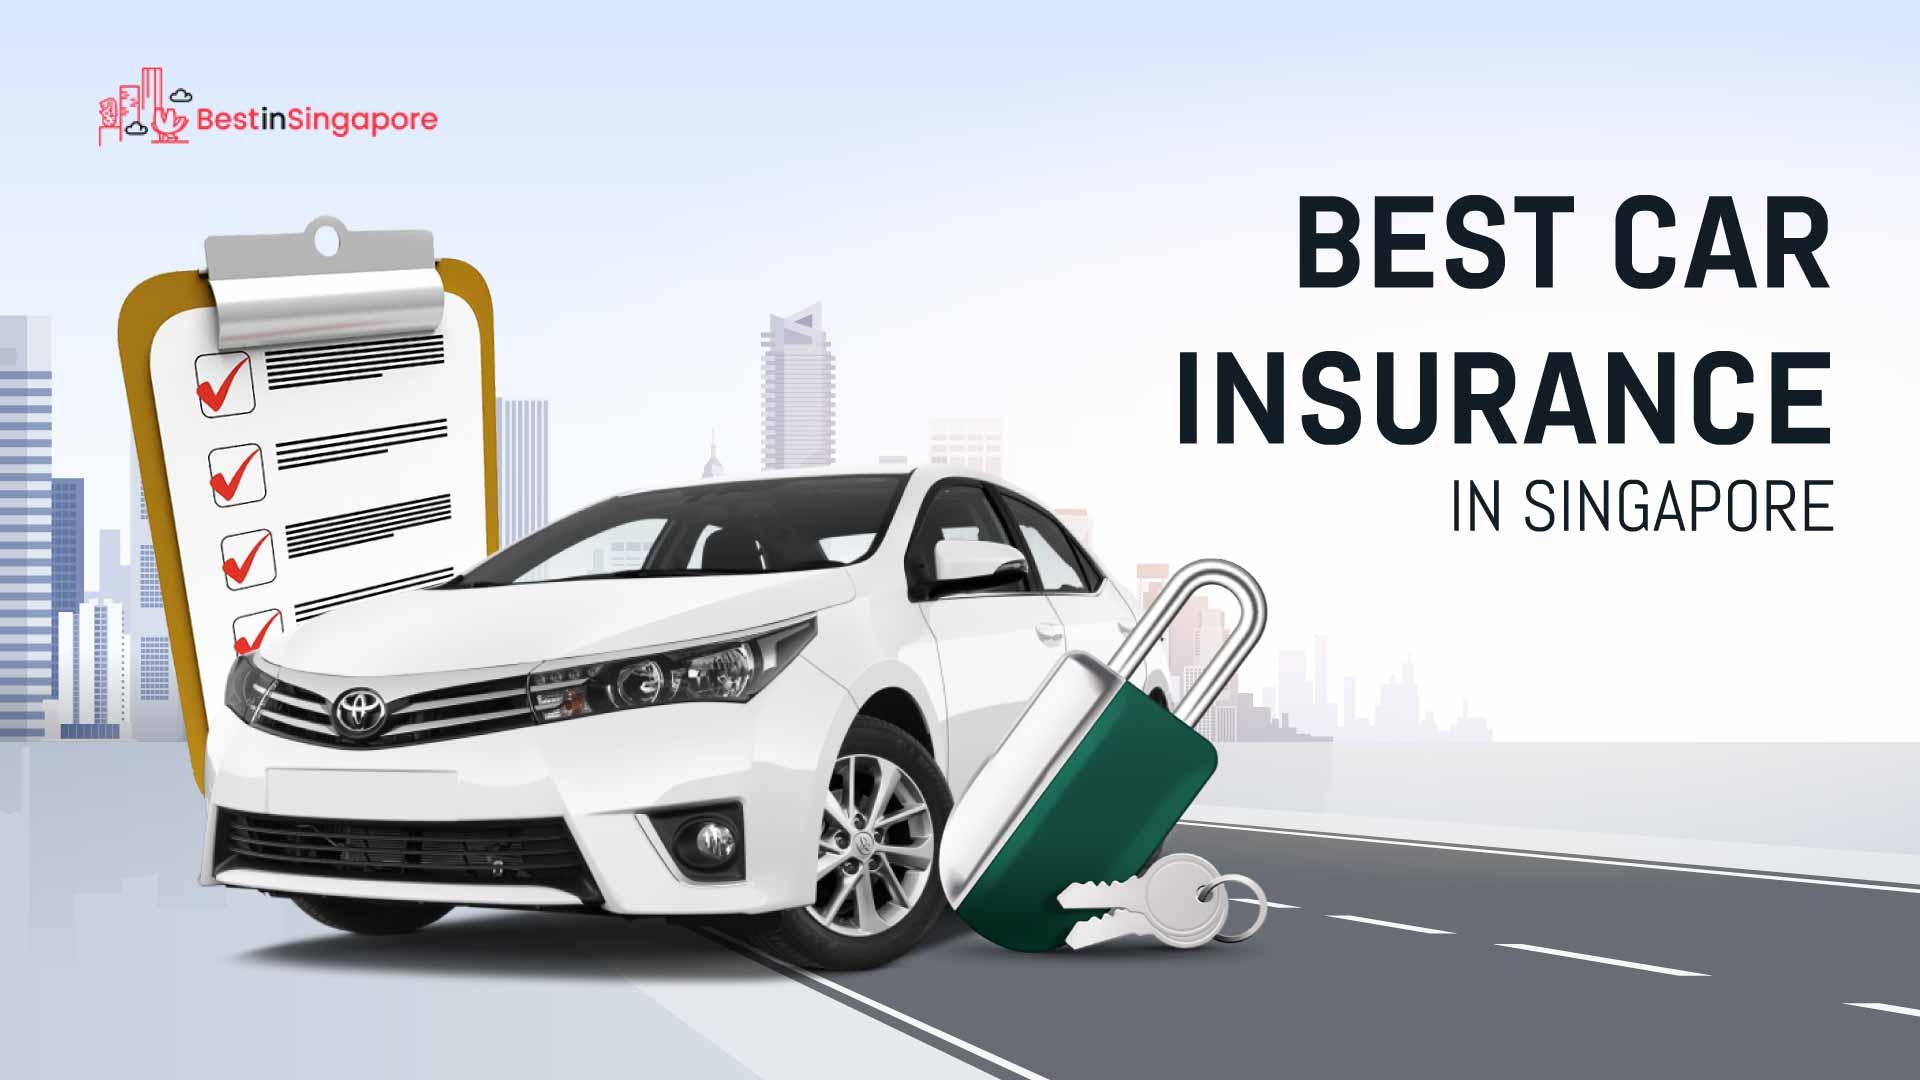 Best Car Insurance in Singapore